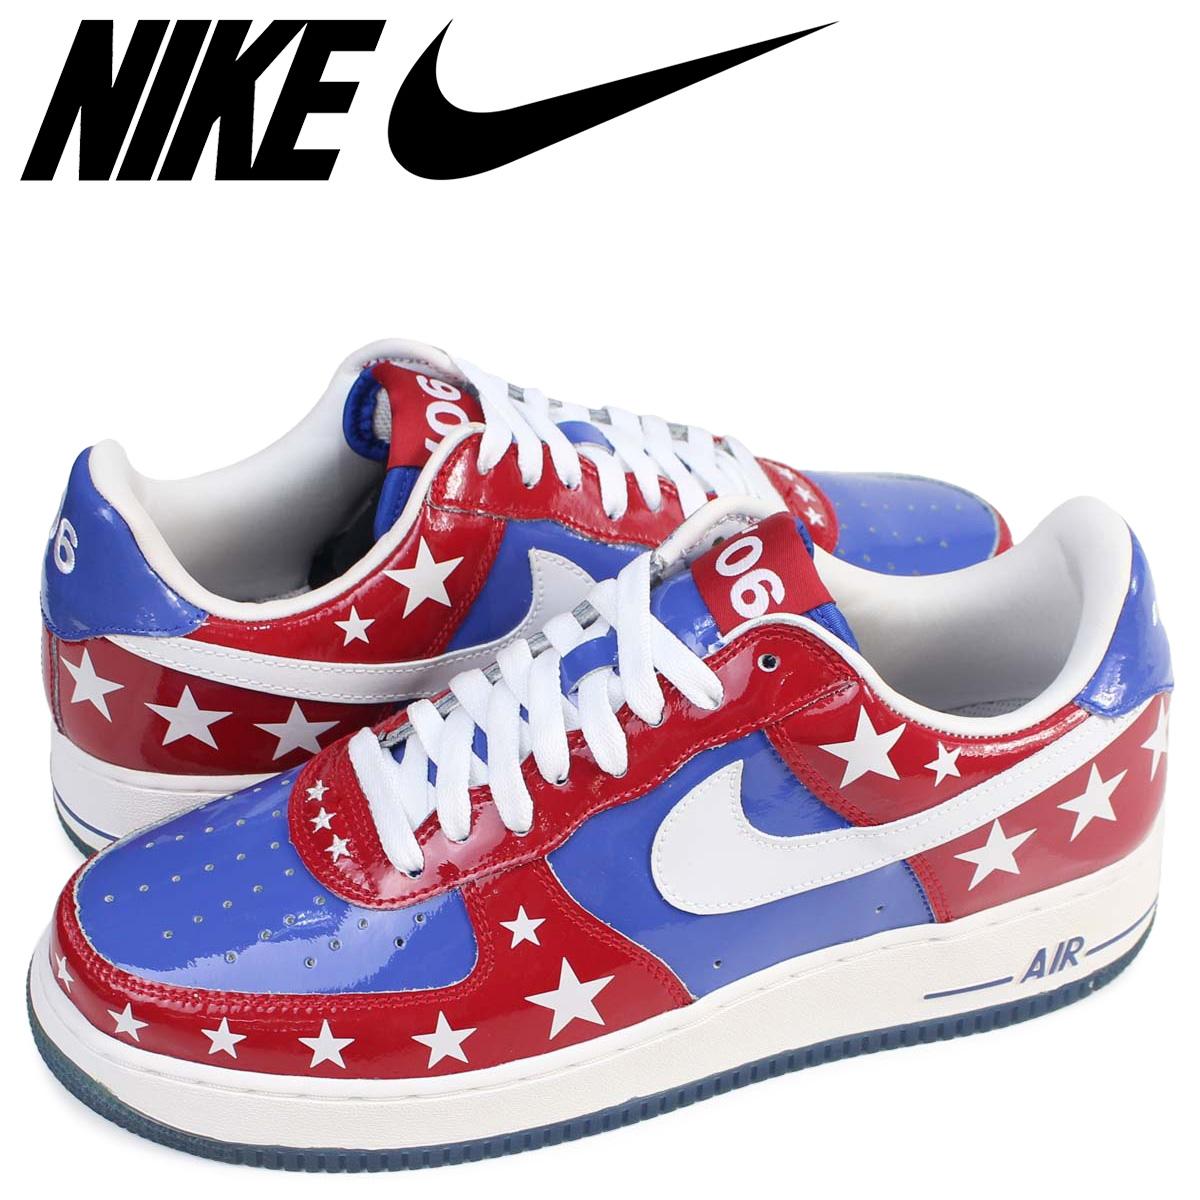 NIKE Nike air force 1 sneakers AIR FORCE 1 PREMIUM ALL STAR 06 309,096 441 low men shoes blue